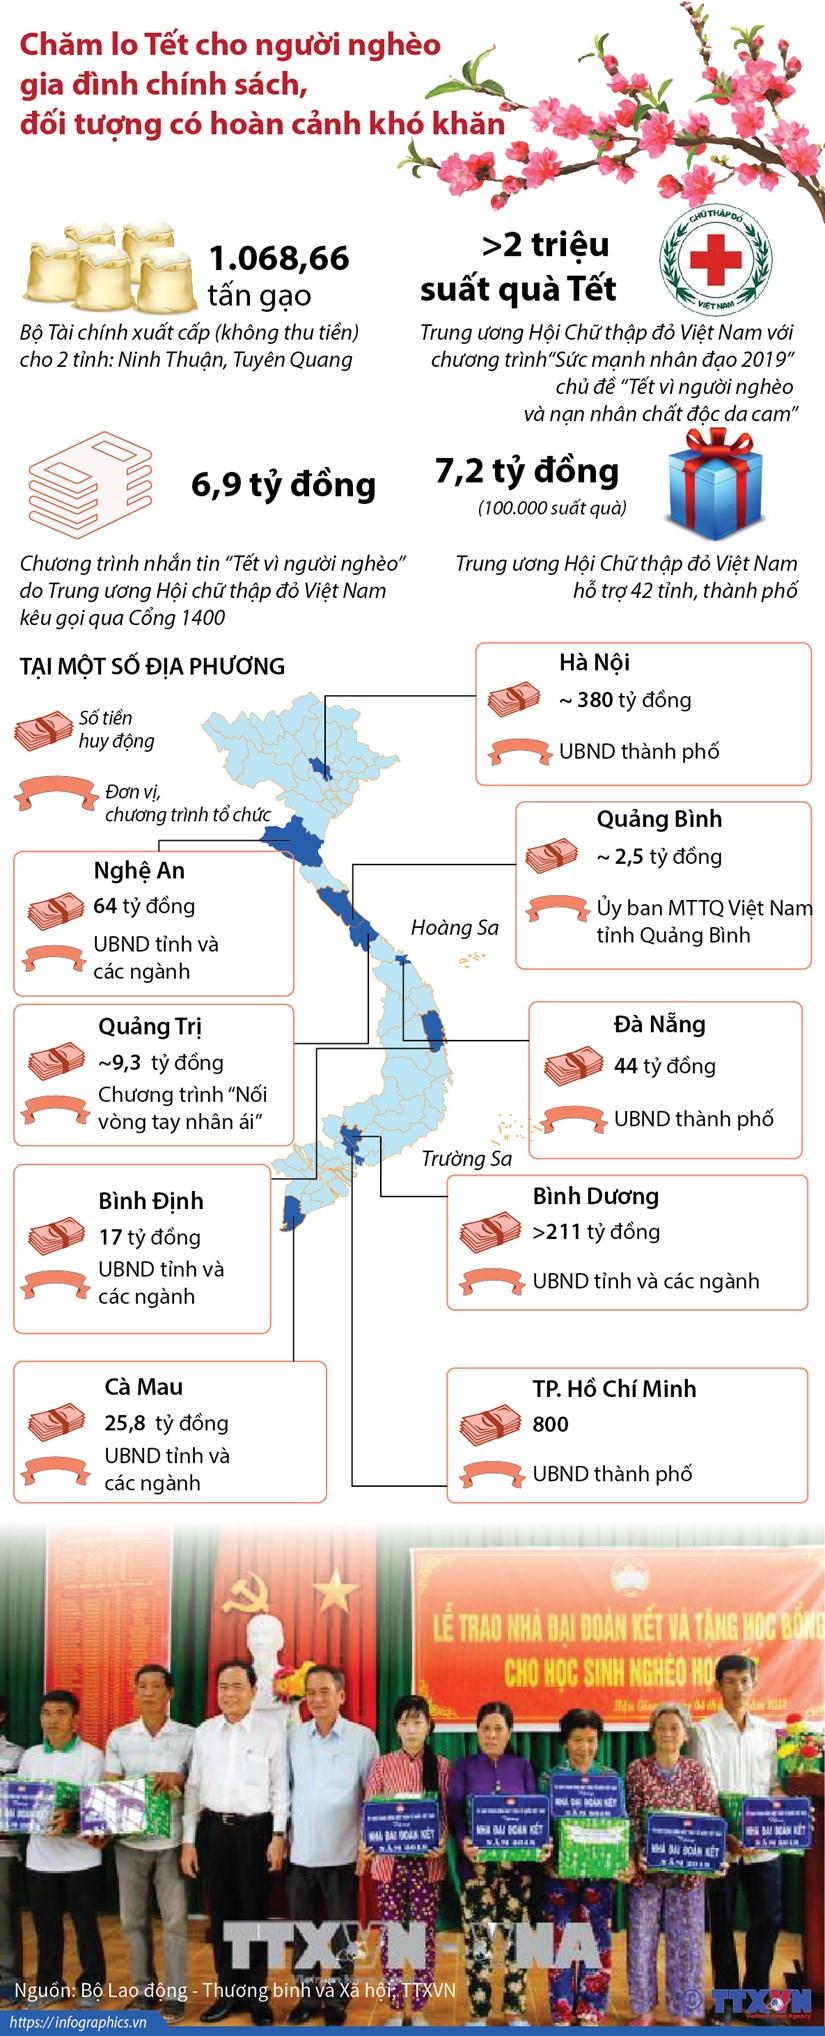 [Infographics] Cham lo Tet cho nguoi ngheo, gia dinh chinh sach hinh anh 1